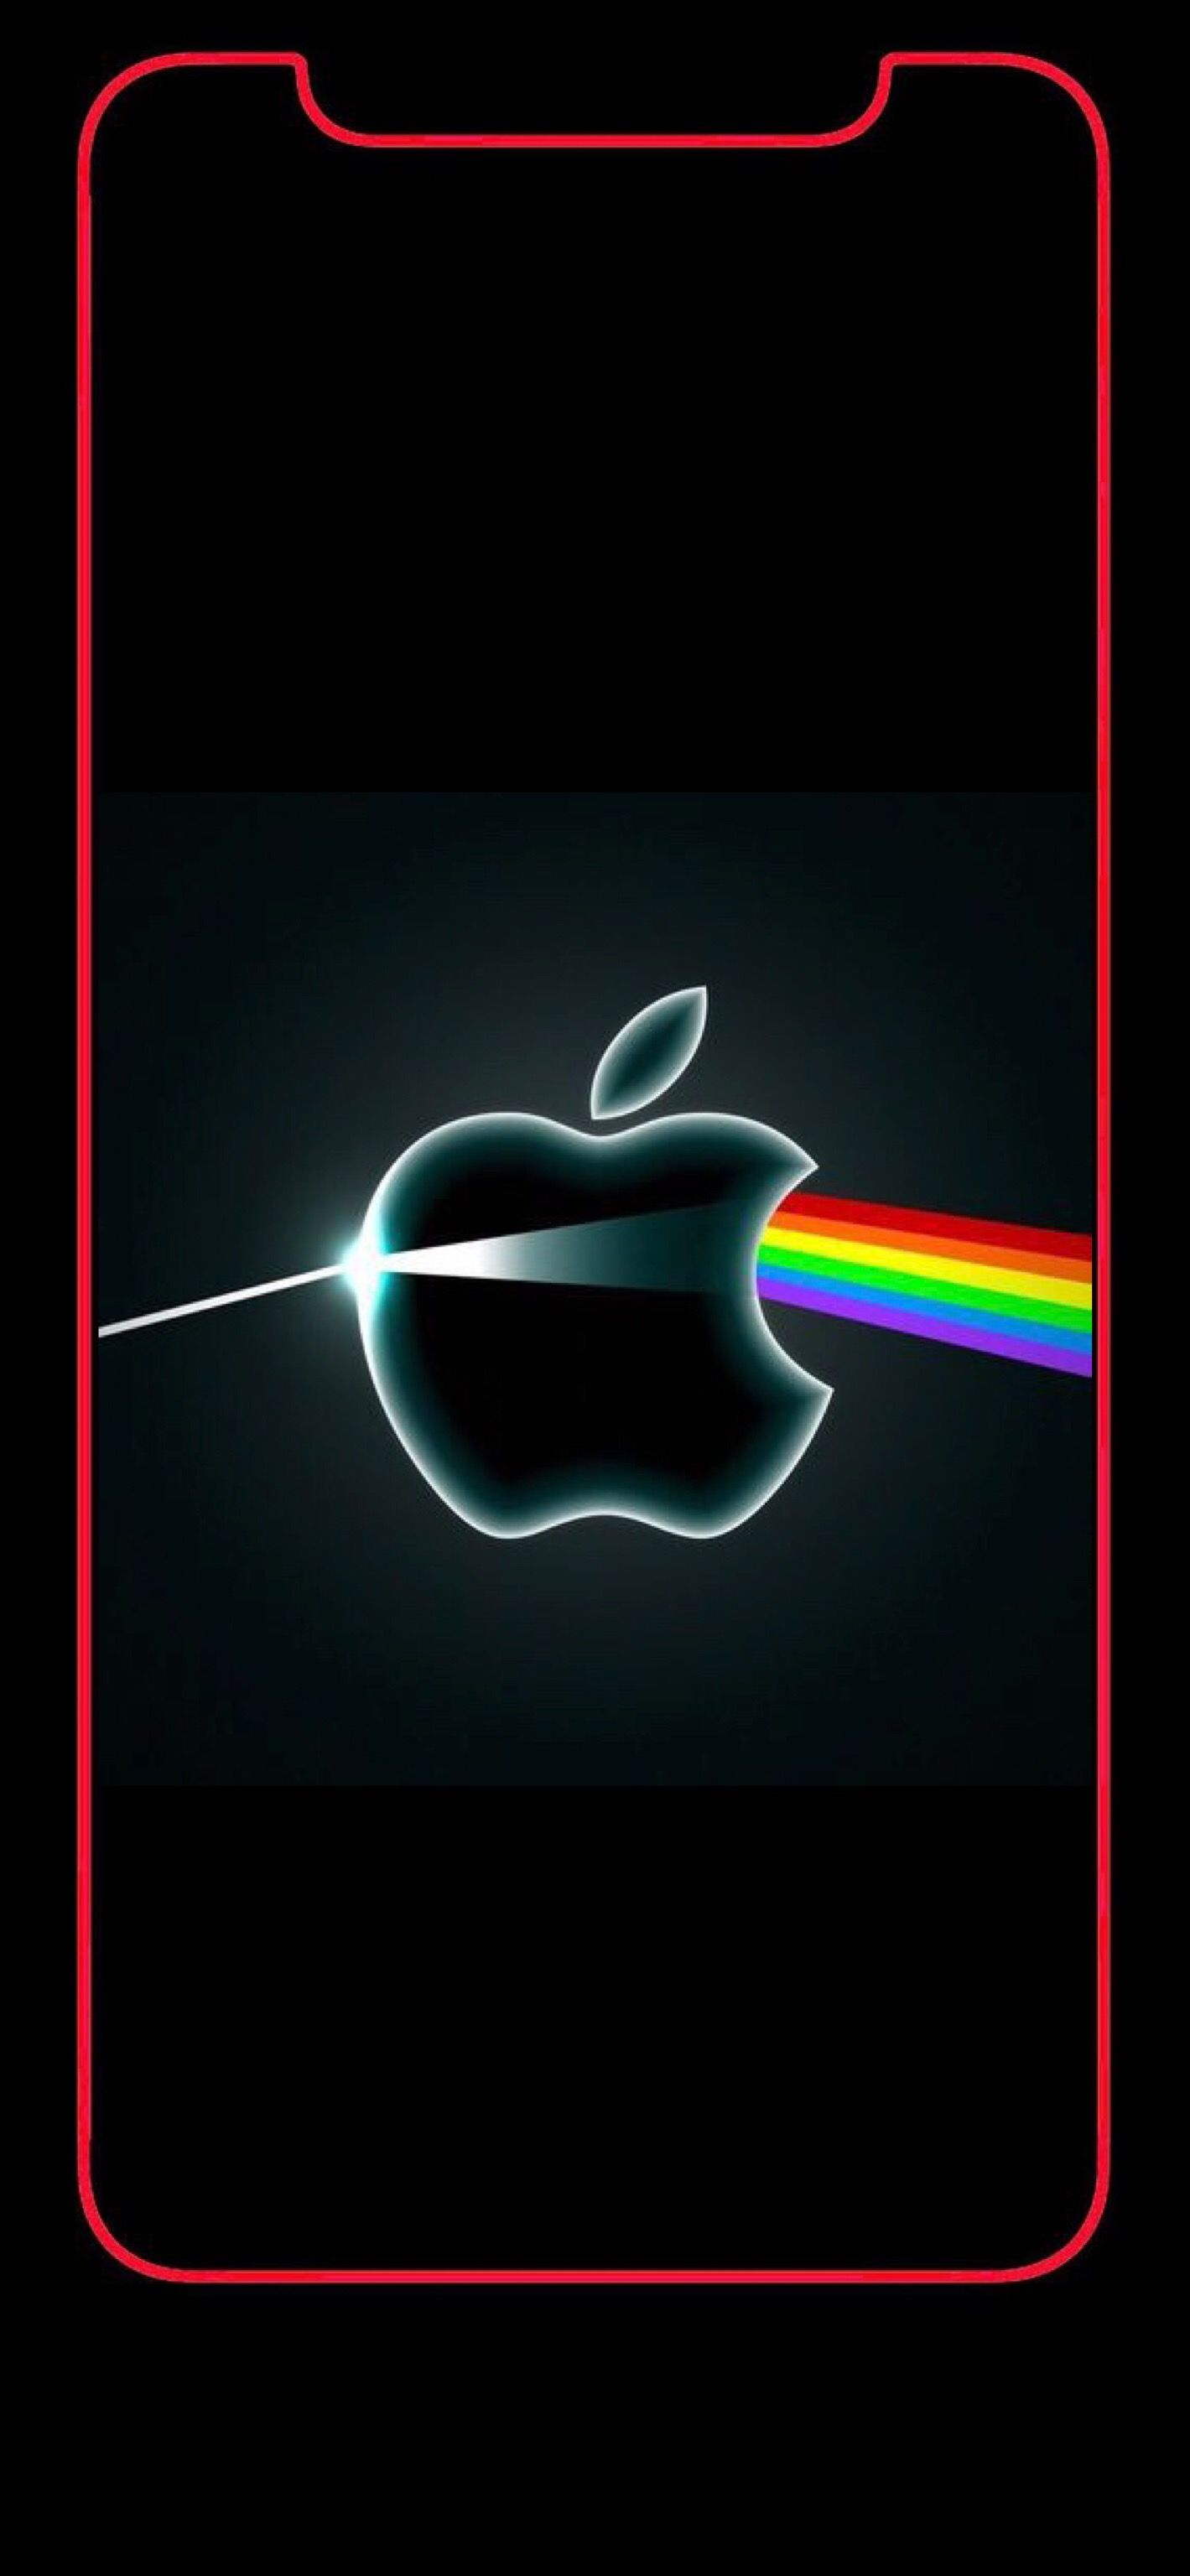 Apple Wallpaper Iphone X - HD Wallpaper